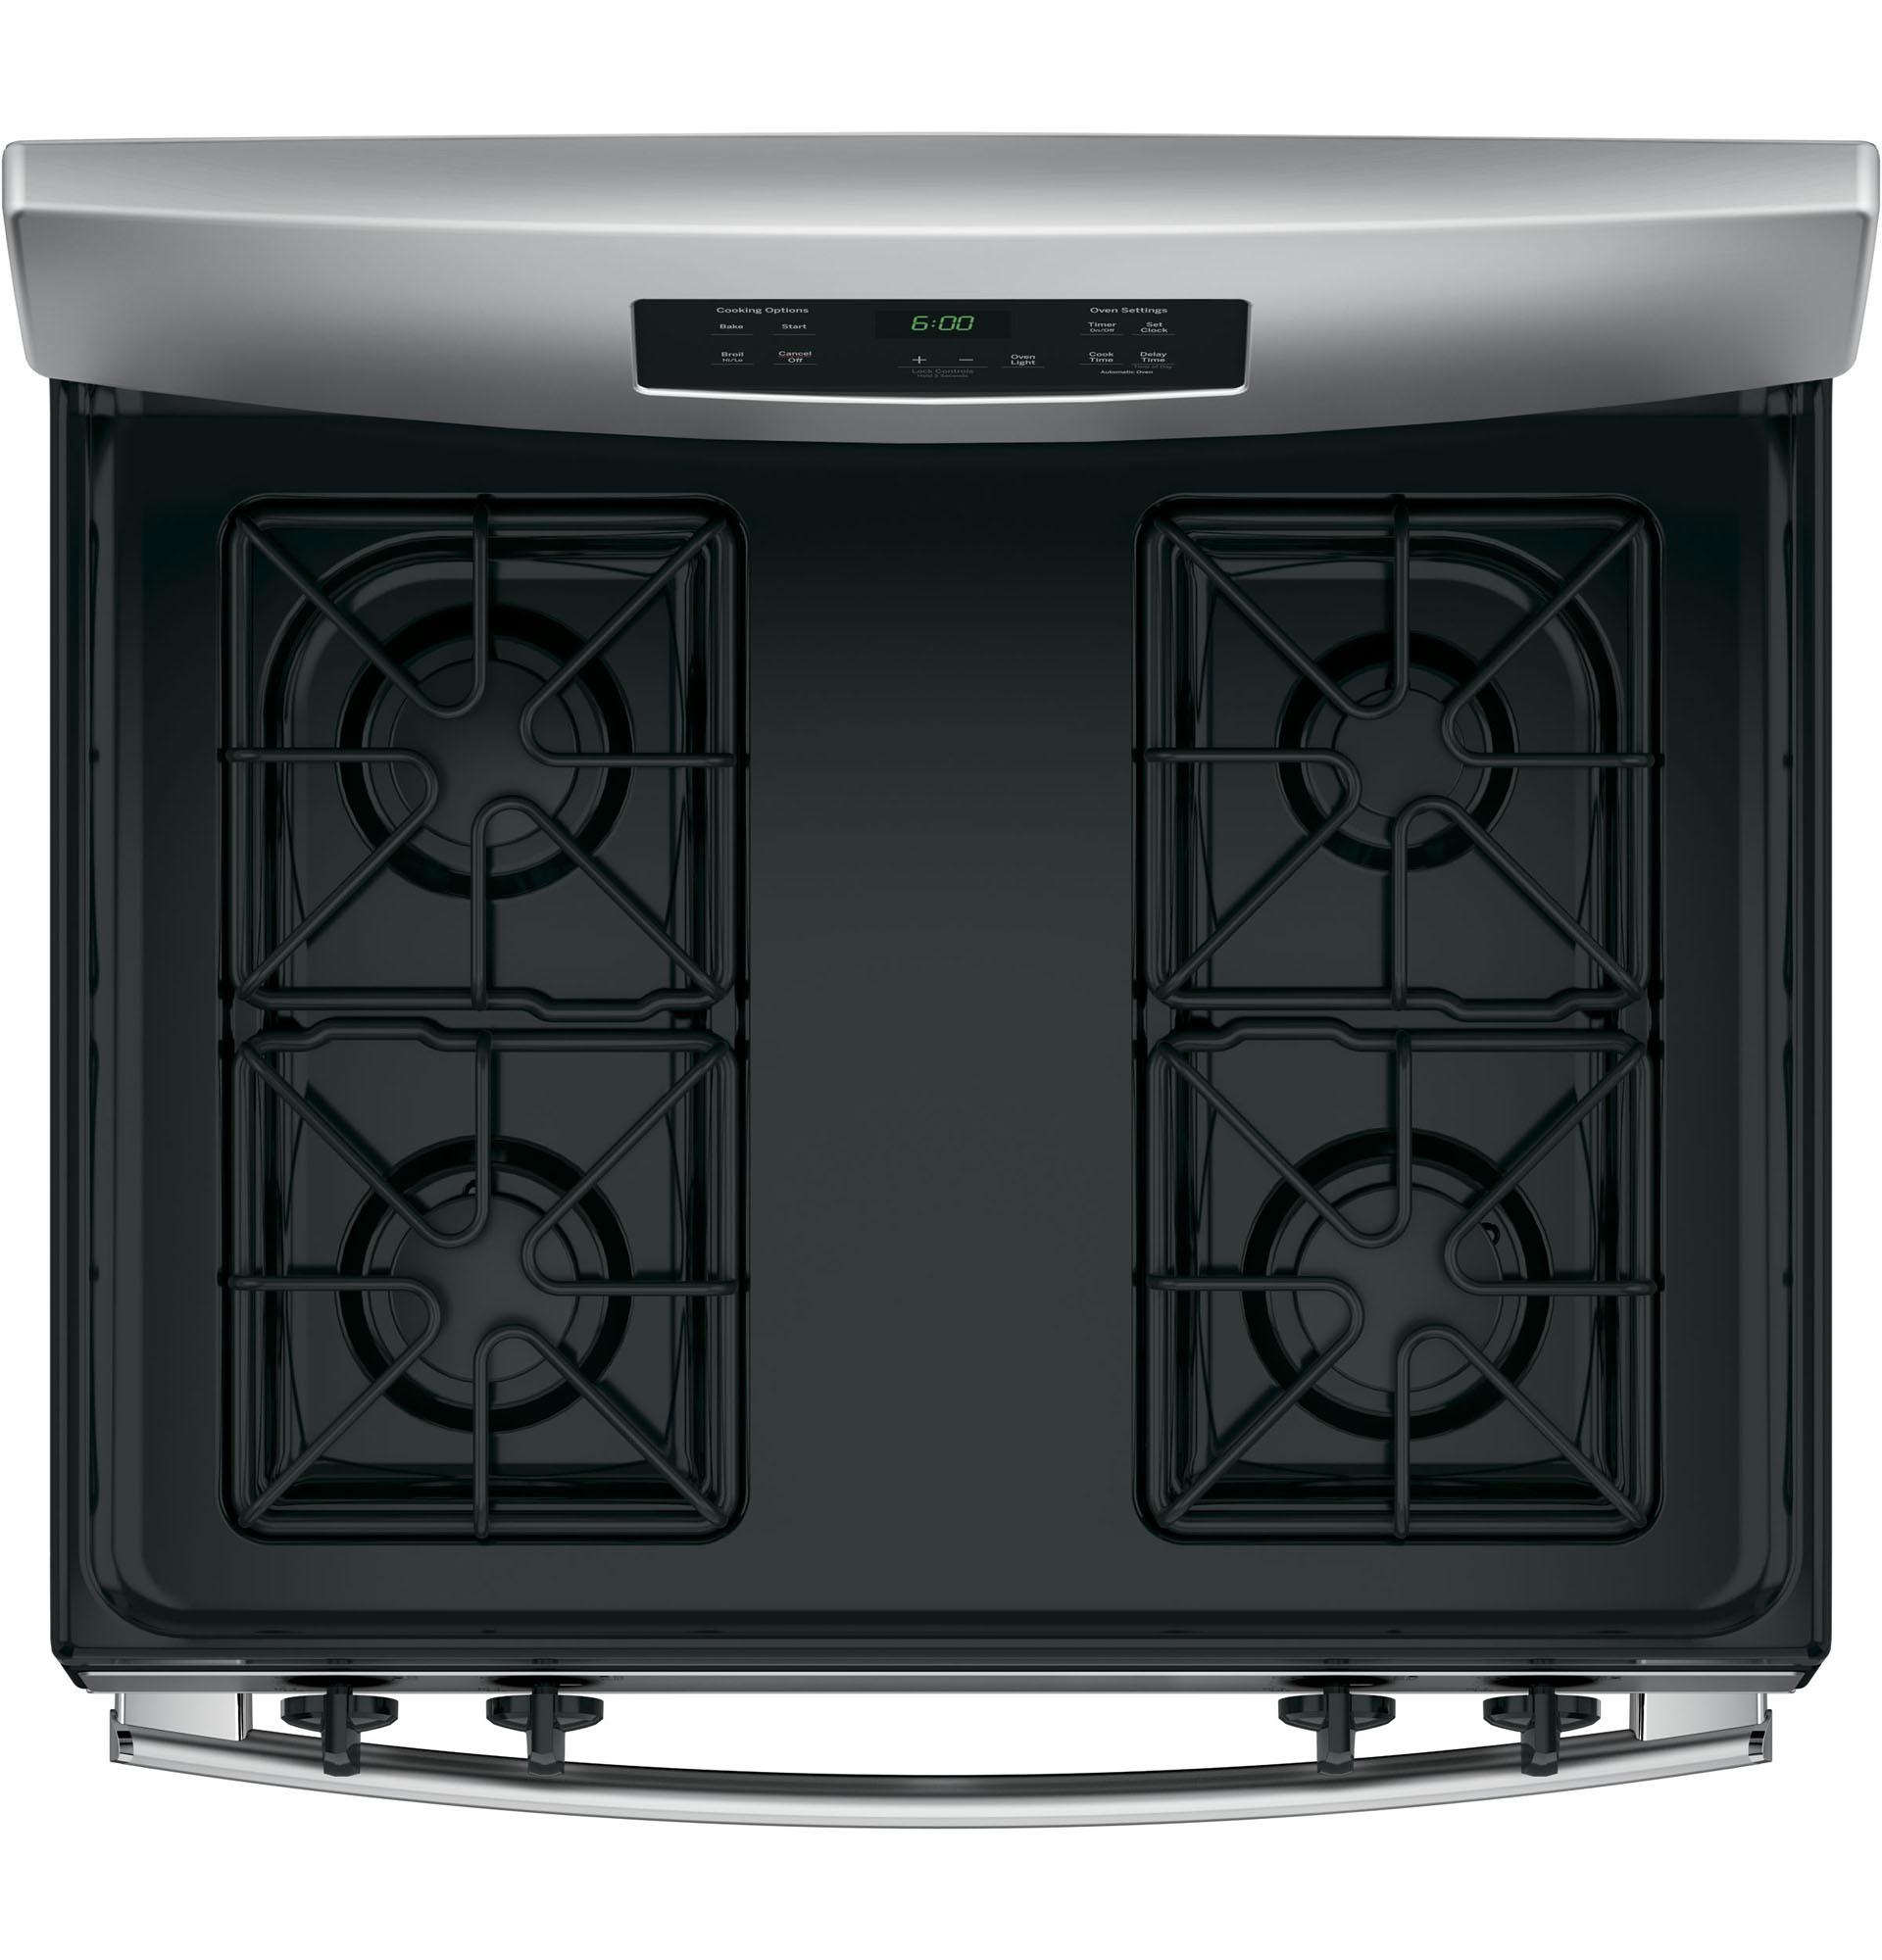 "GE Appliances JGBS60REKSS 30"" Freestanding Gas Range - Stainless Steel"